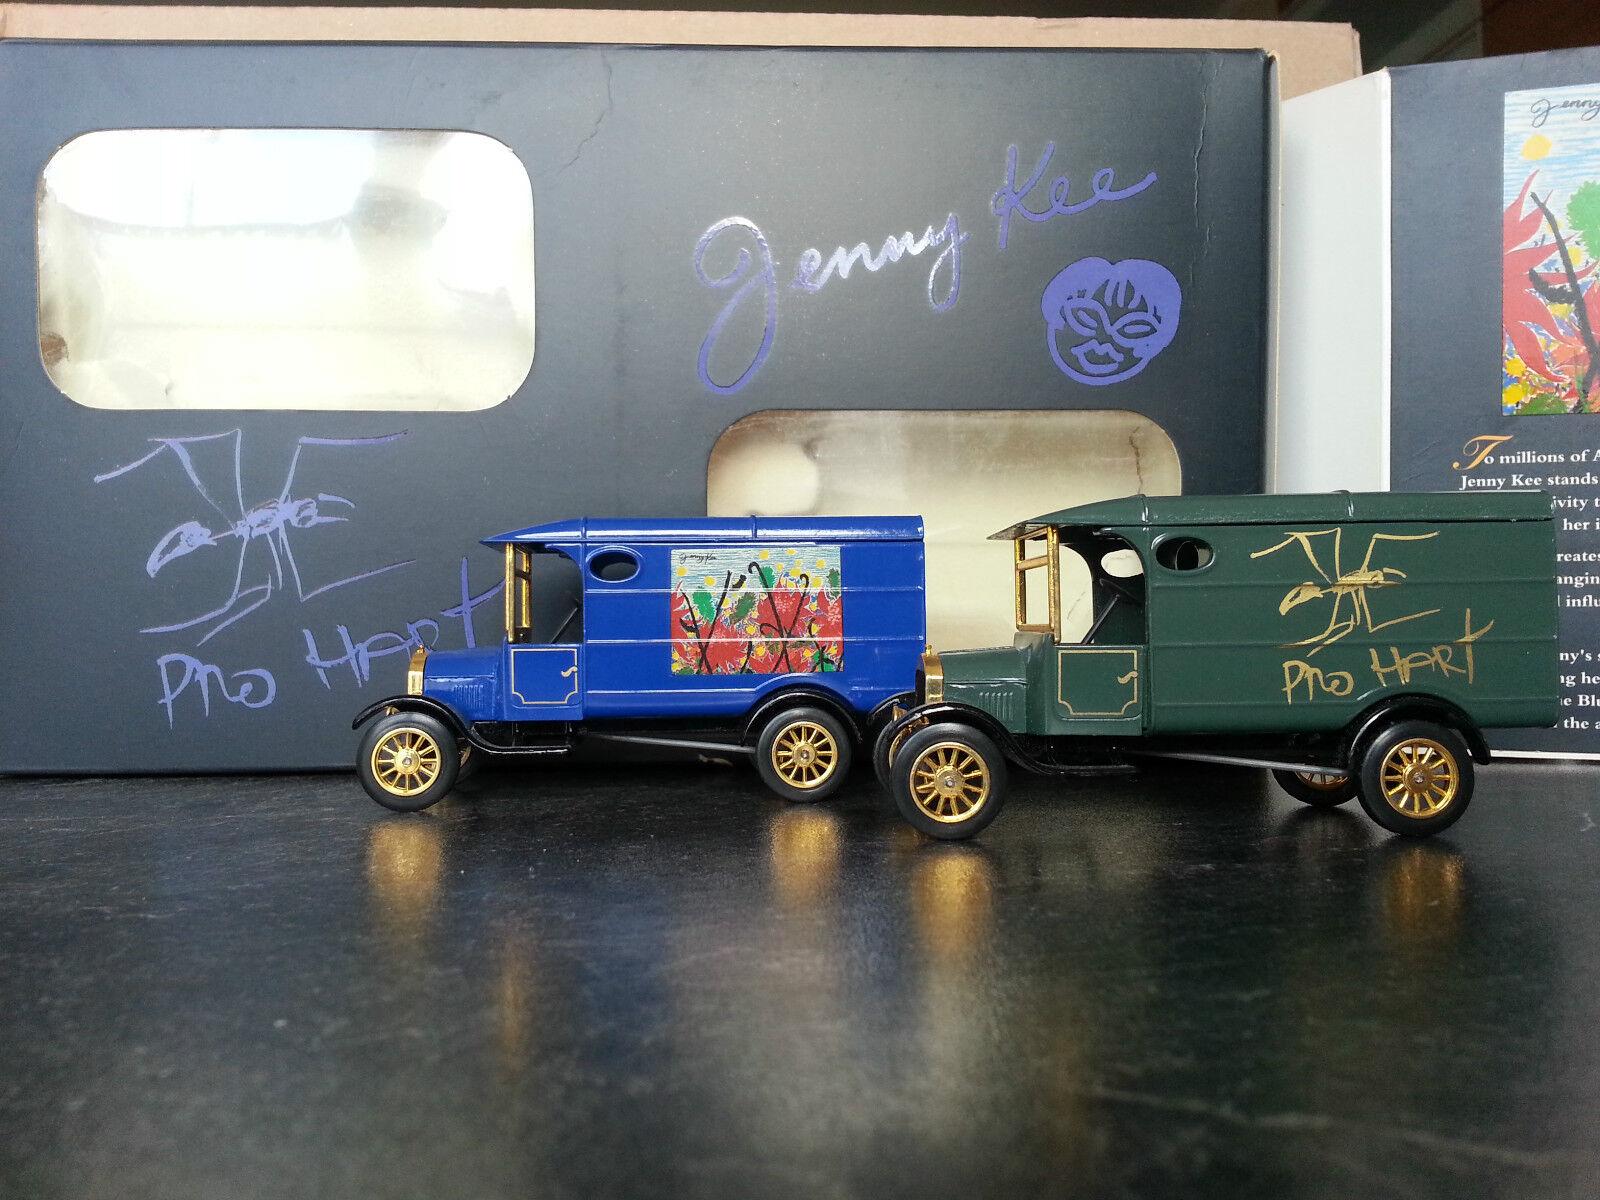 Matchbox pro duro Australian Art Set ford TT nº 17 1000 Jenny Kee yy-21